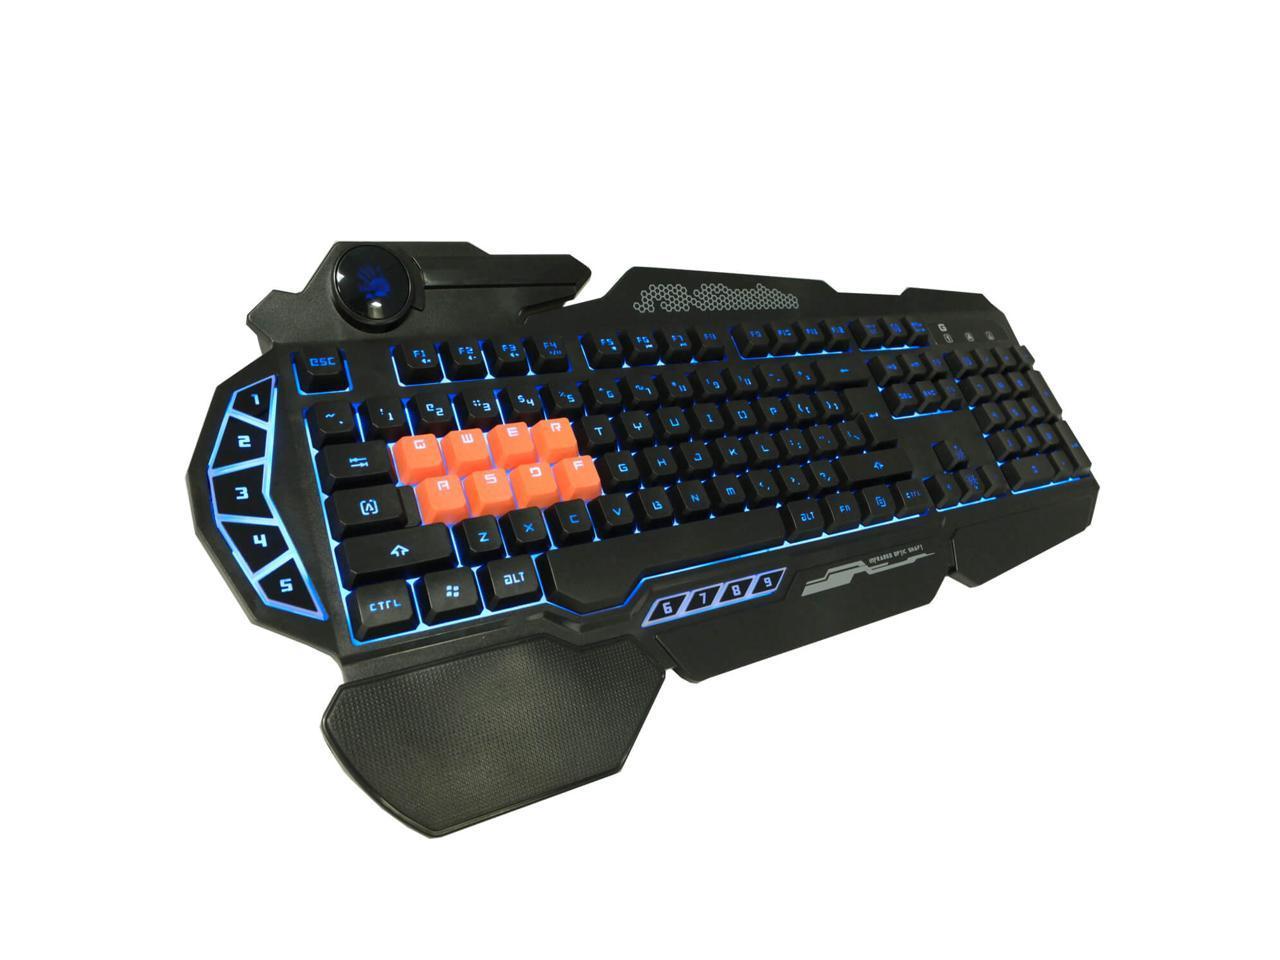 Геймърска клавиатура Bloody B318 Light strike, 8-Infrared Swich, USB, кирилизирана